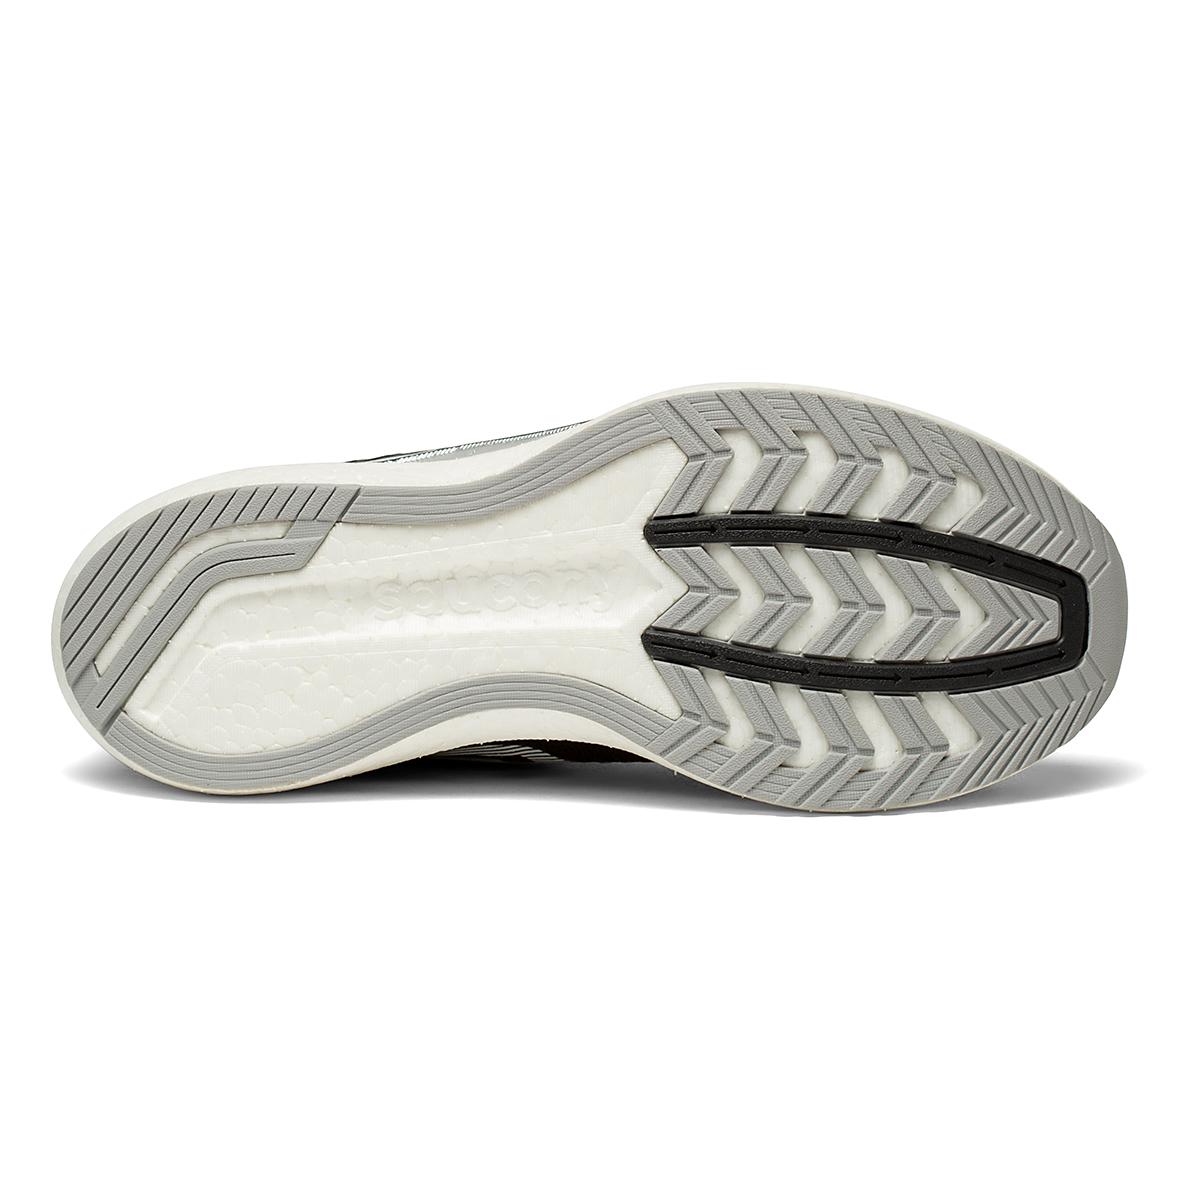 Women's Saucony Endorphin Speed 2 Running Shoe - Color: Black/Shadow - Size: 5 - Width: Regular, Black/Shadow, large, image 3